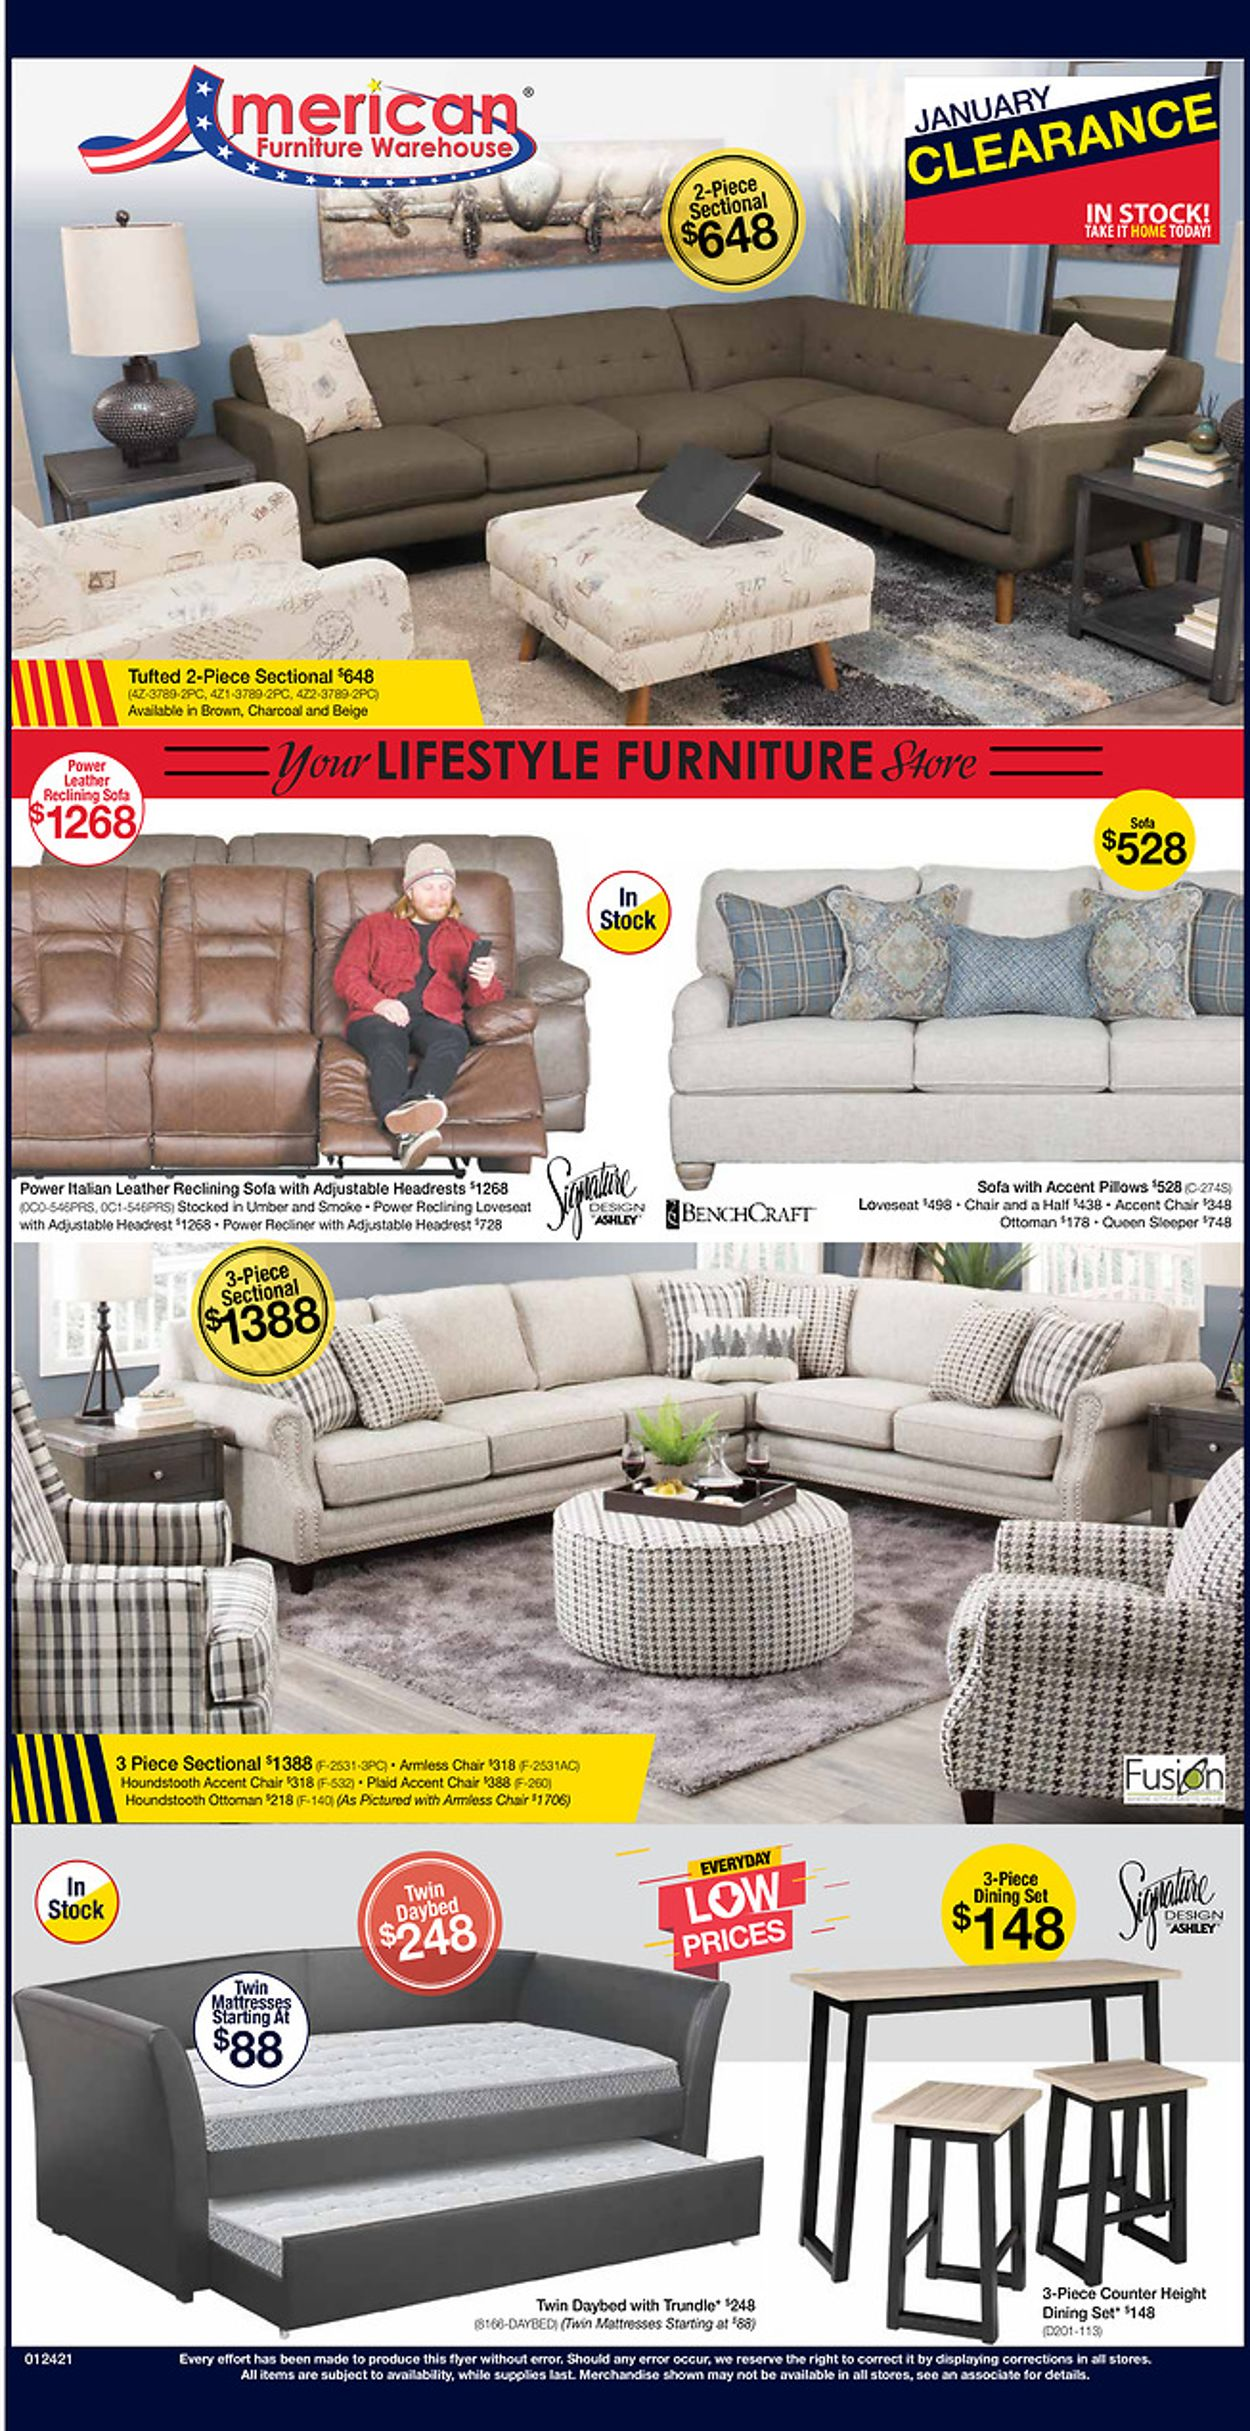 American Furniture Warehouse Weekly Ad Circular - valid 01/25-01/30/2021